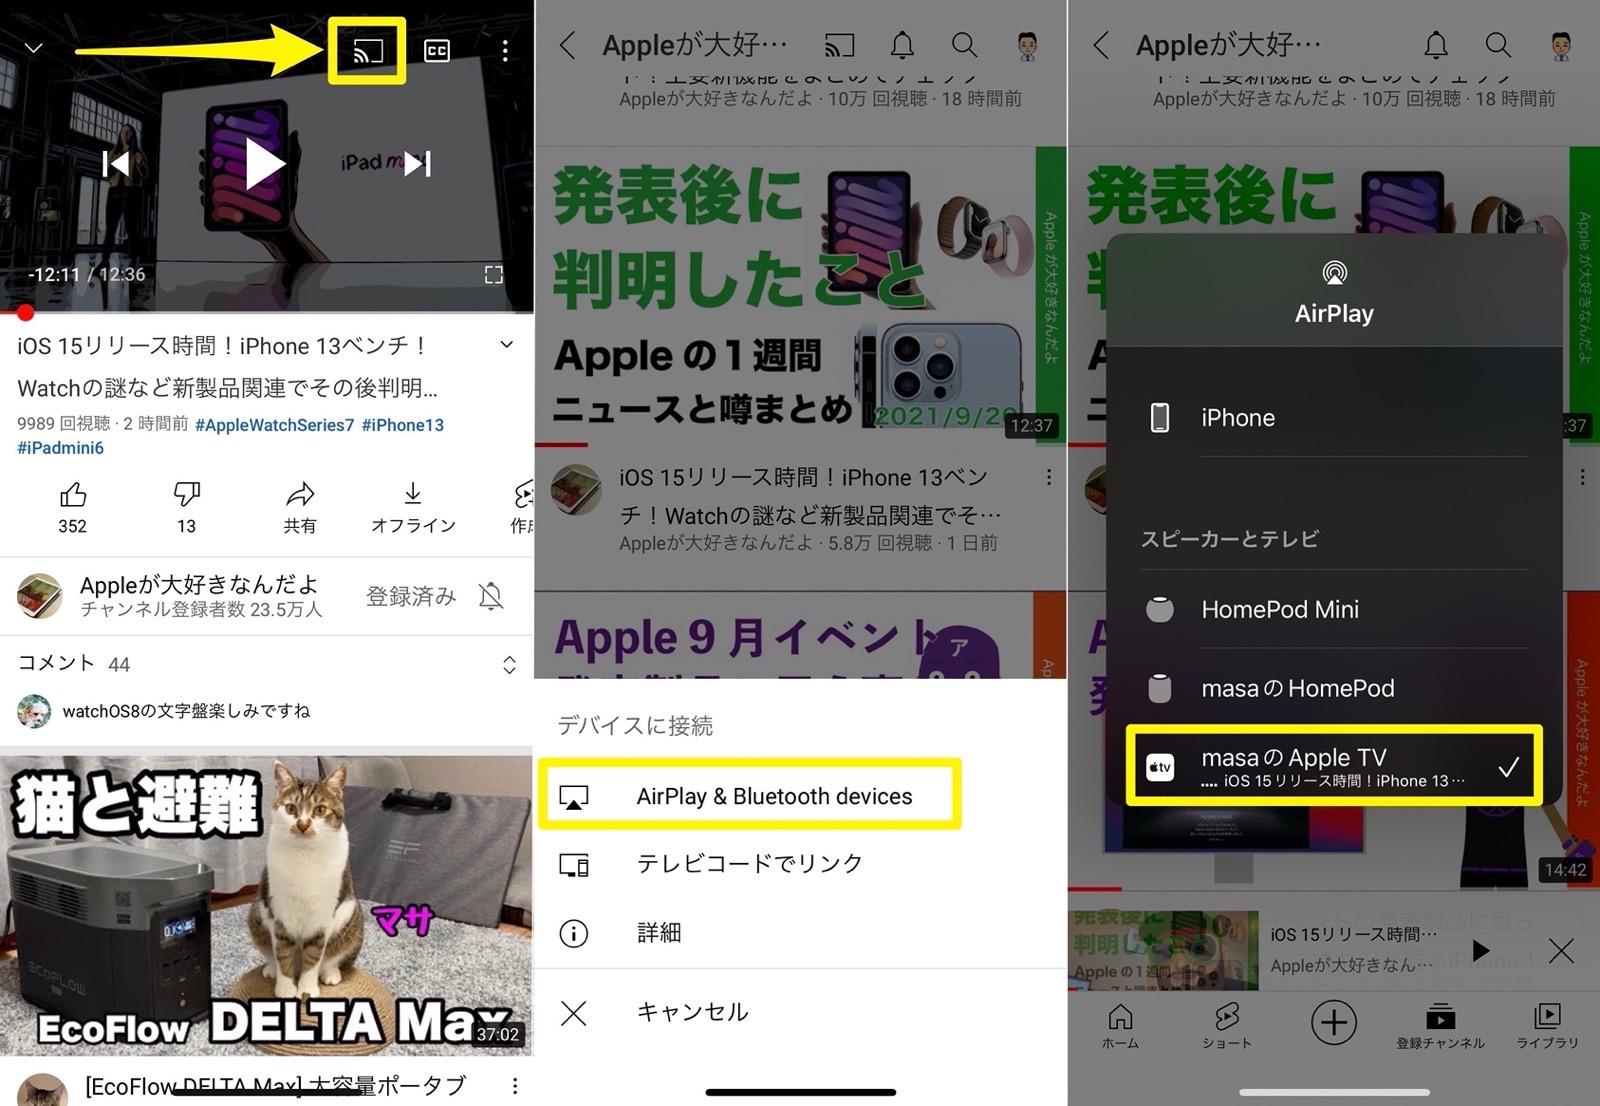 Apple tv mirroring65